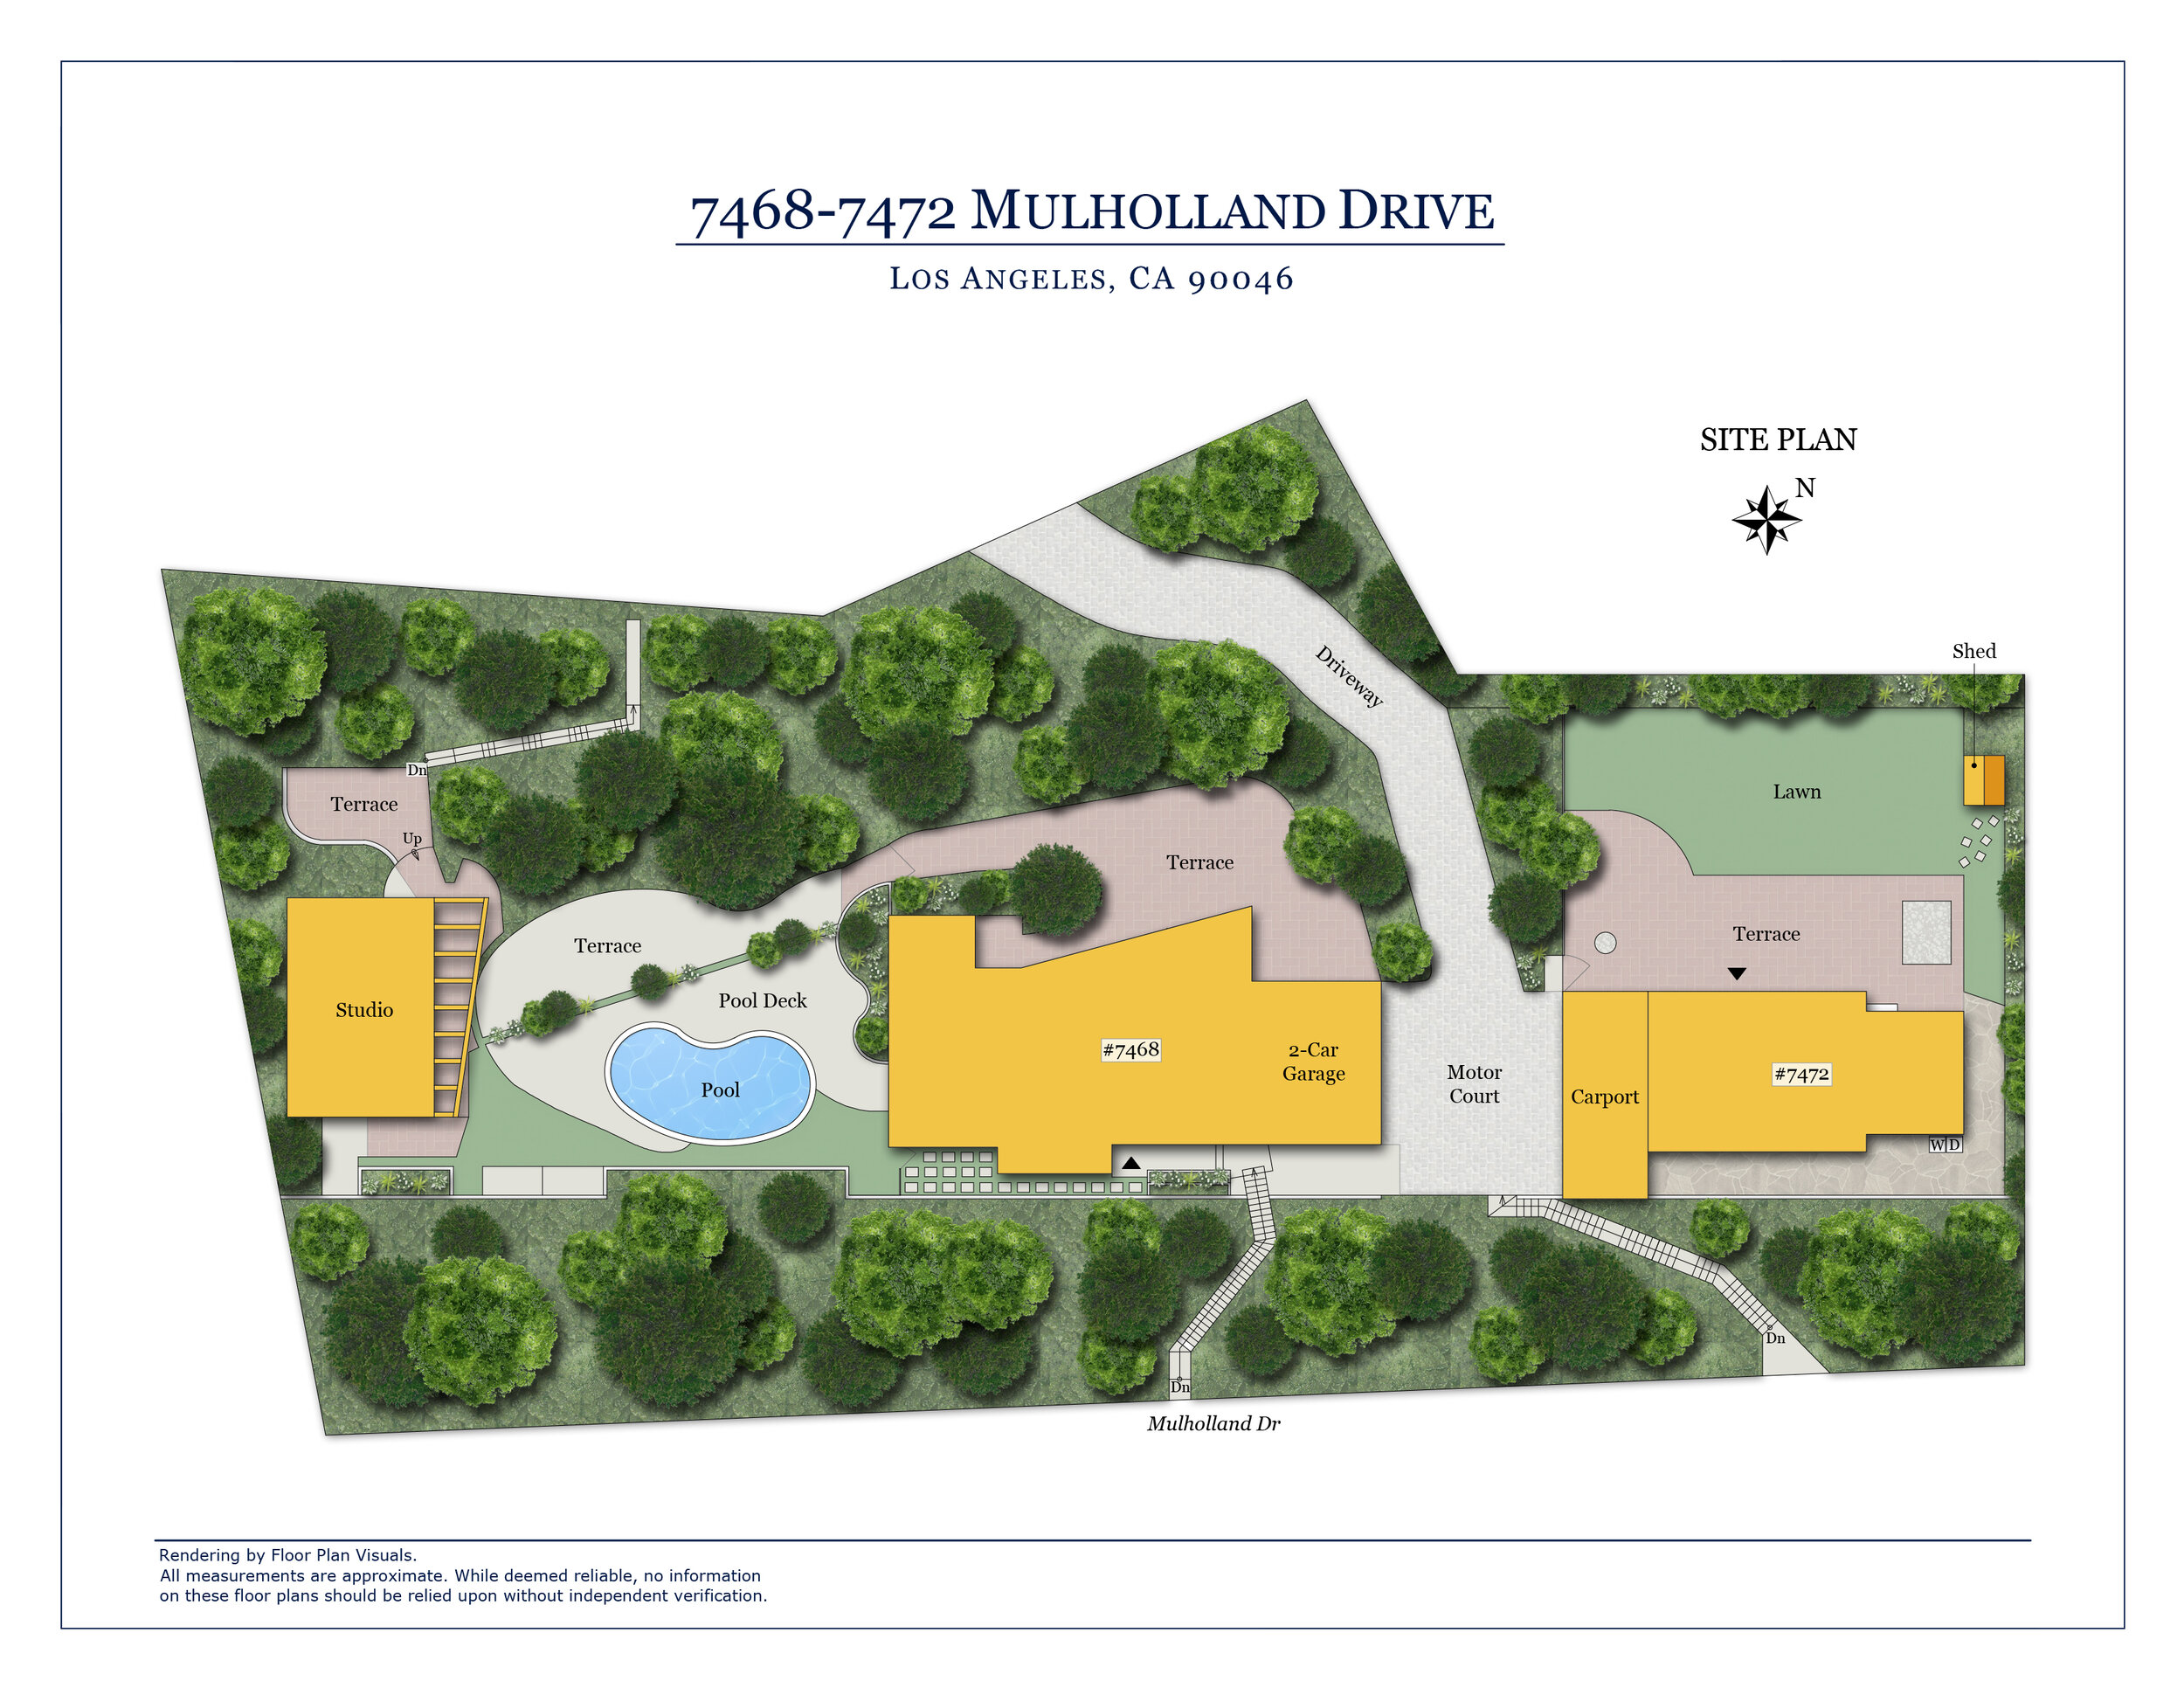 7468-7472 Mulholland Drive Site Plan.jpg